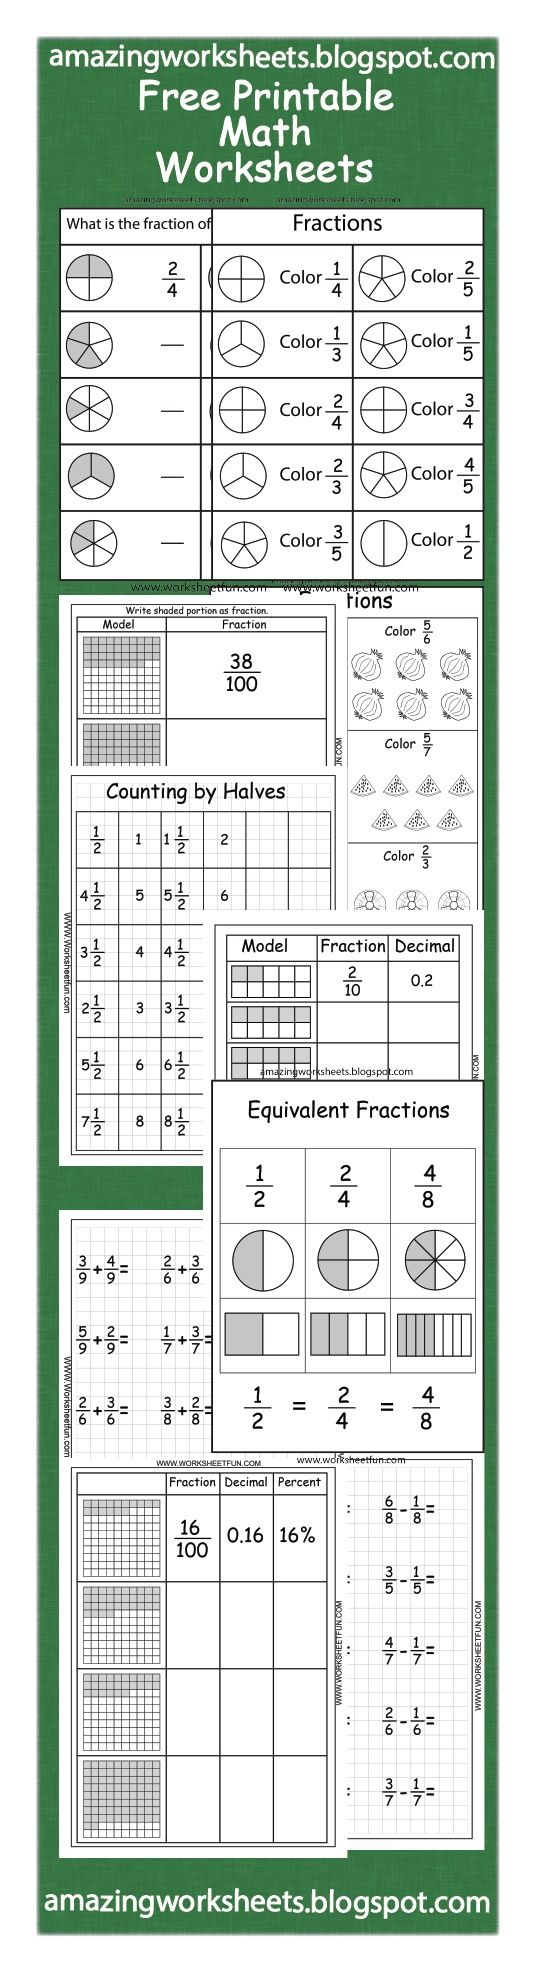 Uncategorized Ks2 Worksheets Maths best 20 maths worksheets ks2 ideas on pinterest free printable fractions httpwww worksheetfun com